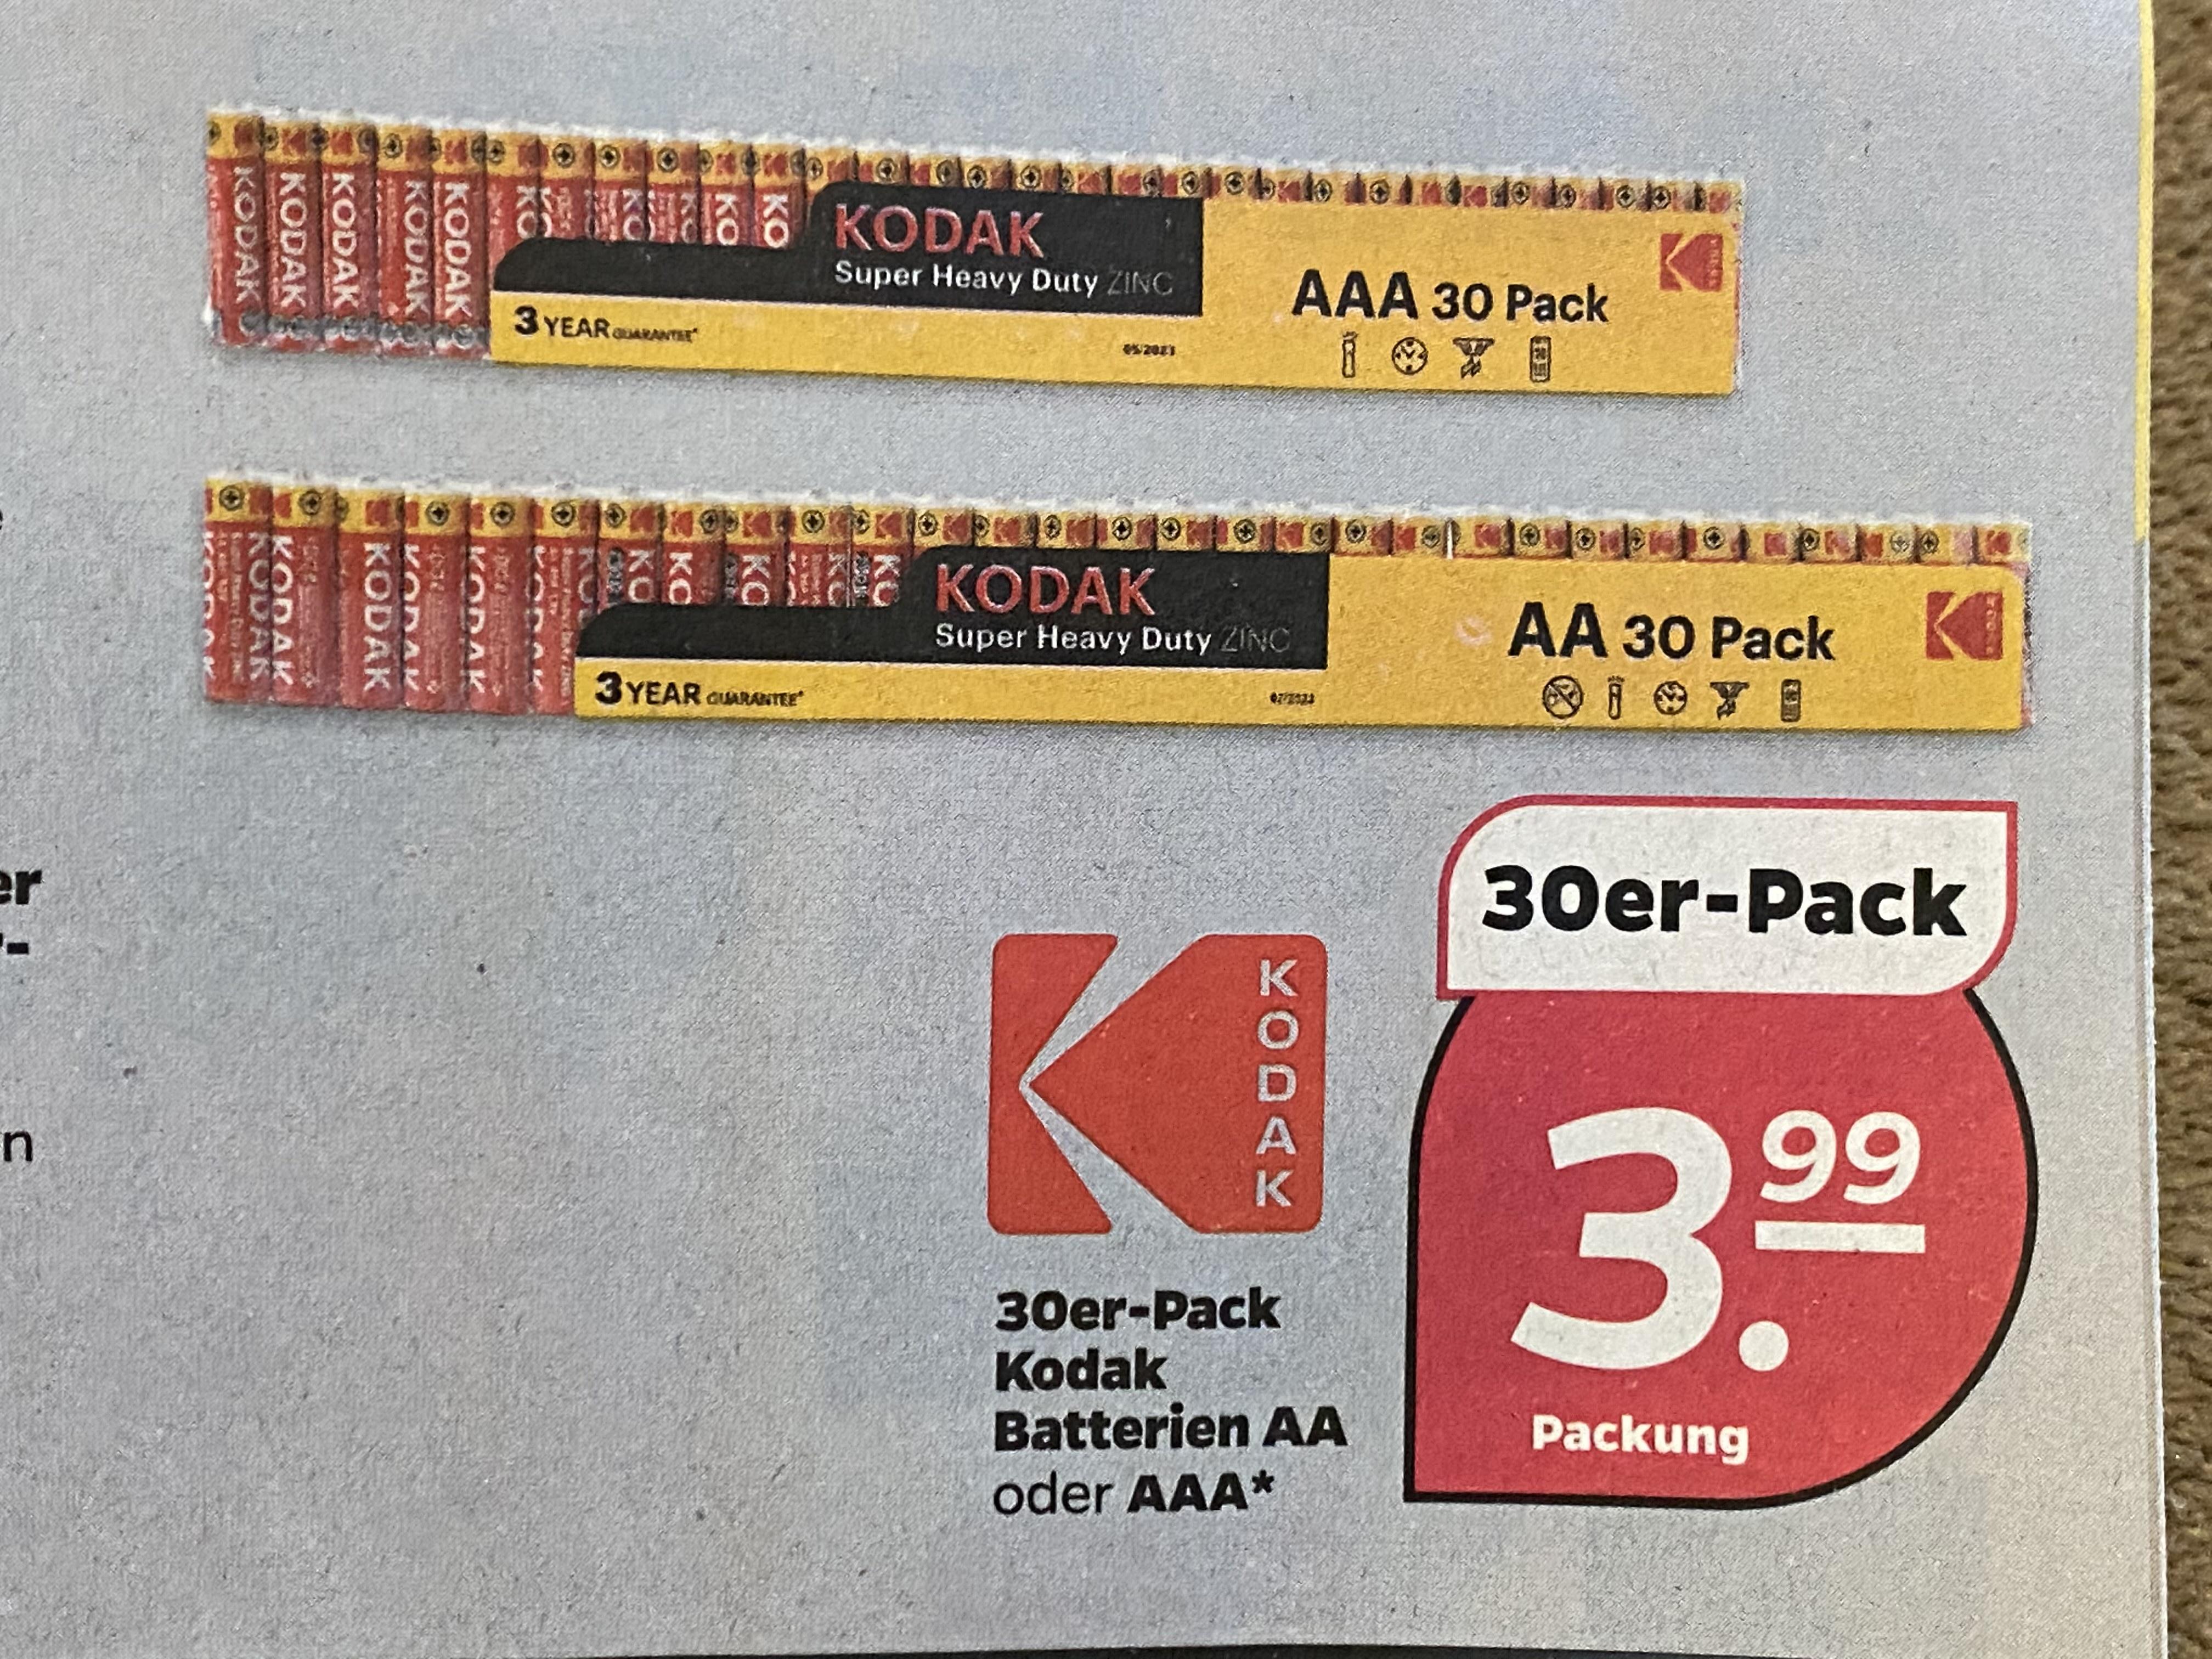 AA & AAA Batterien 30er Pack Kodak ab 14.01.-16.01. Netto schwarz/gelb